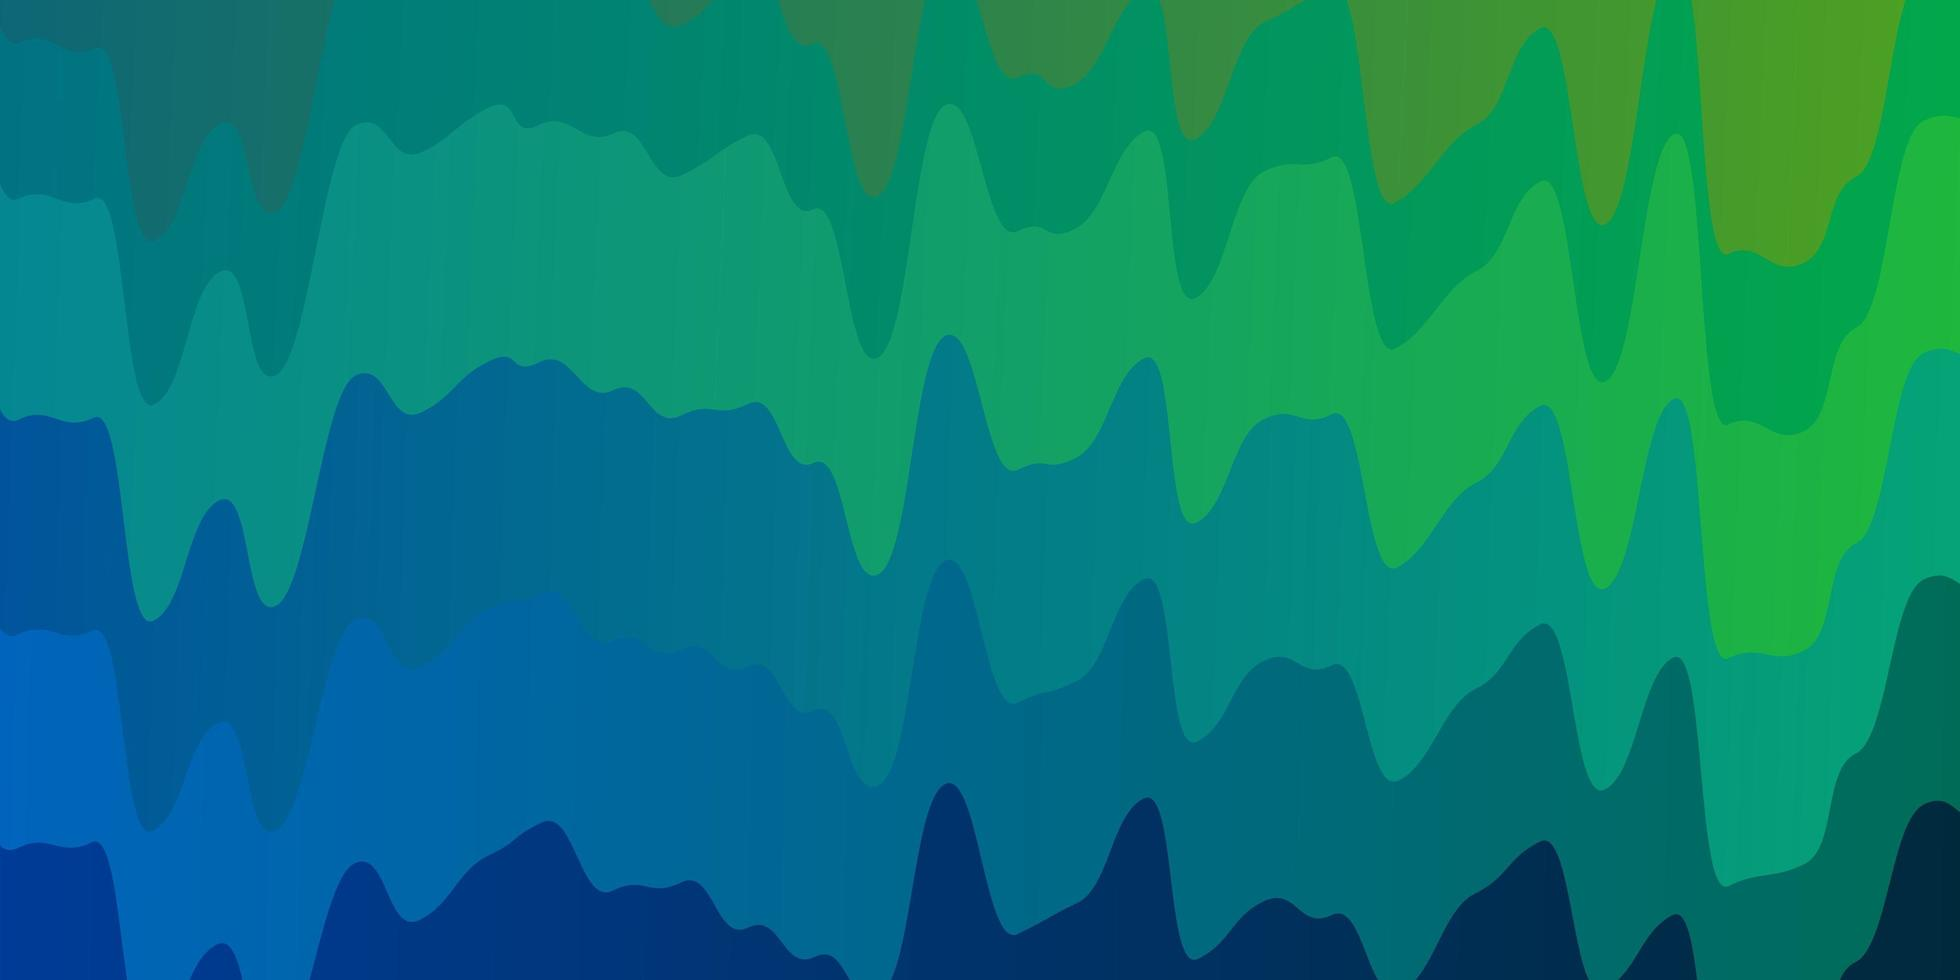 hellblaues, grünes Vektormuster mit Kurven. vektor